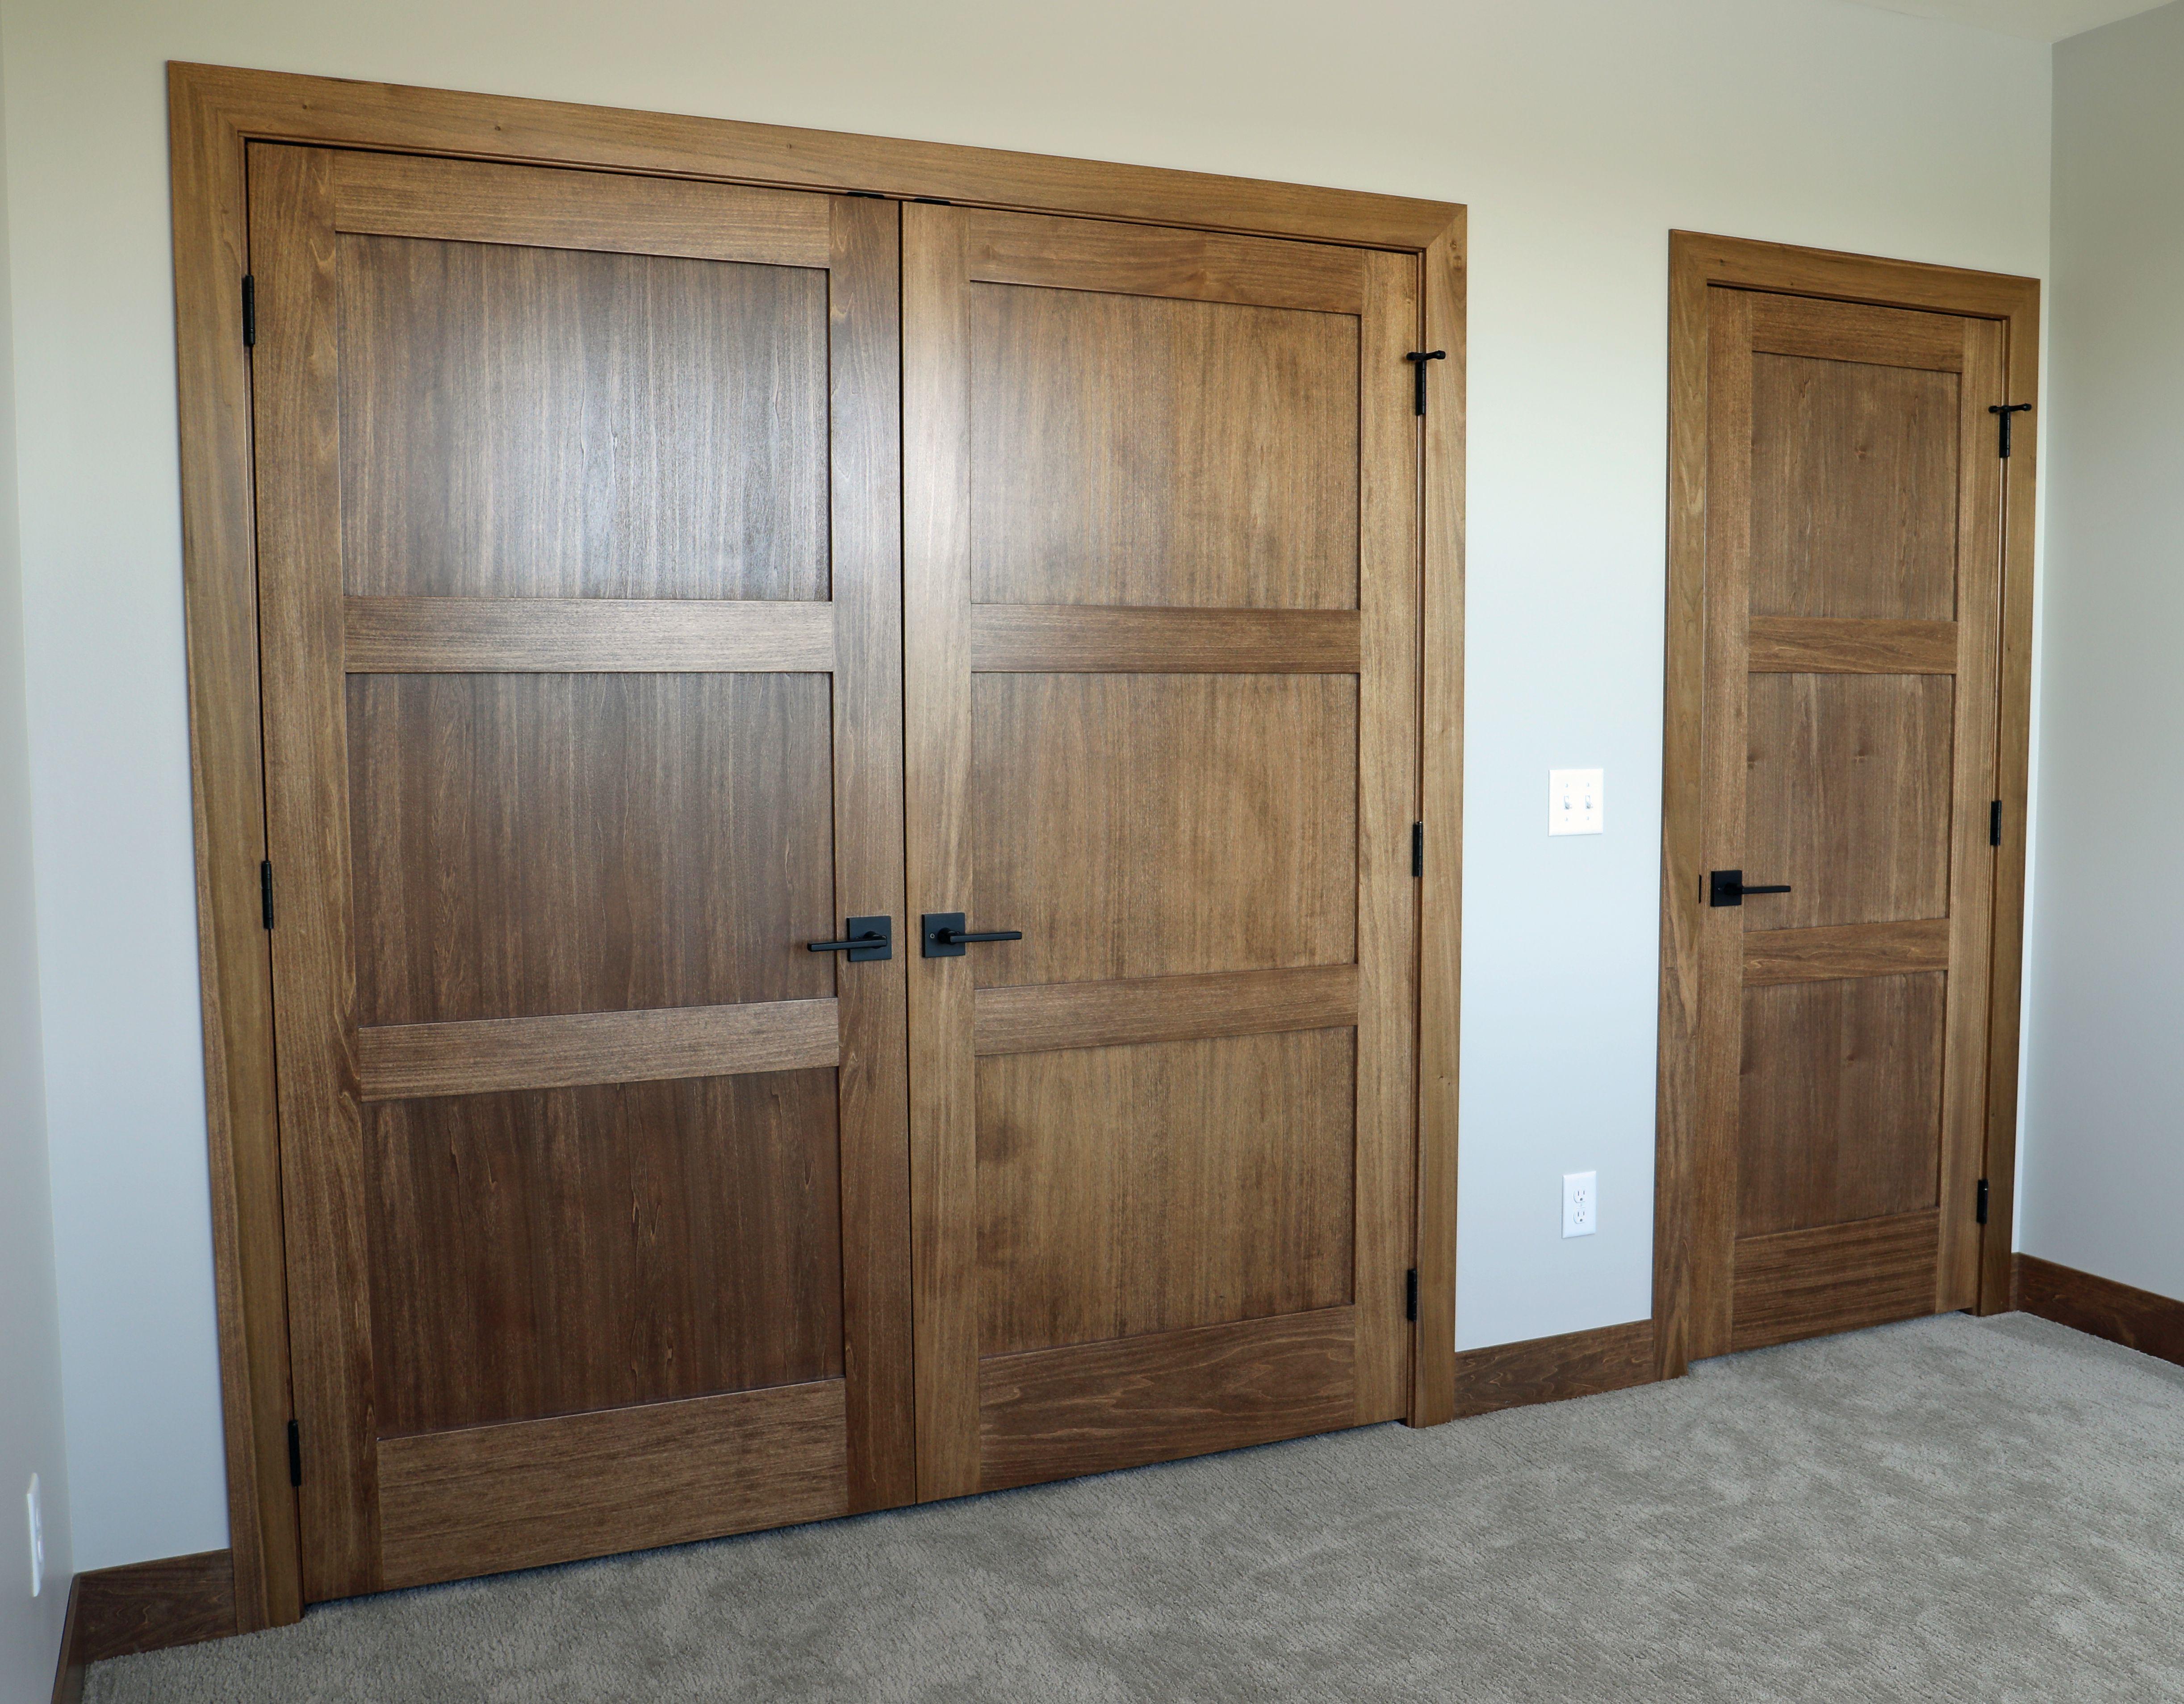 Which Doors How To Choose In 2020 Doors Interior Panel Doors Tall Cabinet Storage